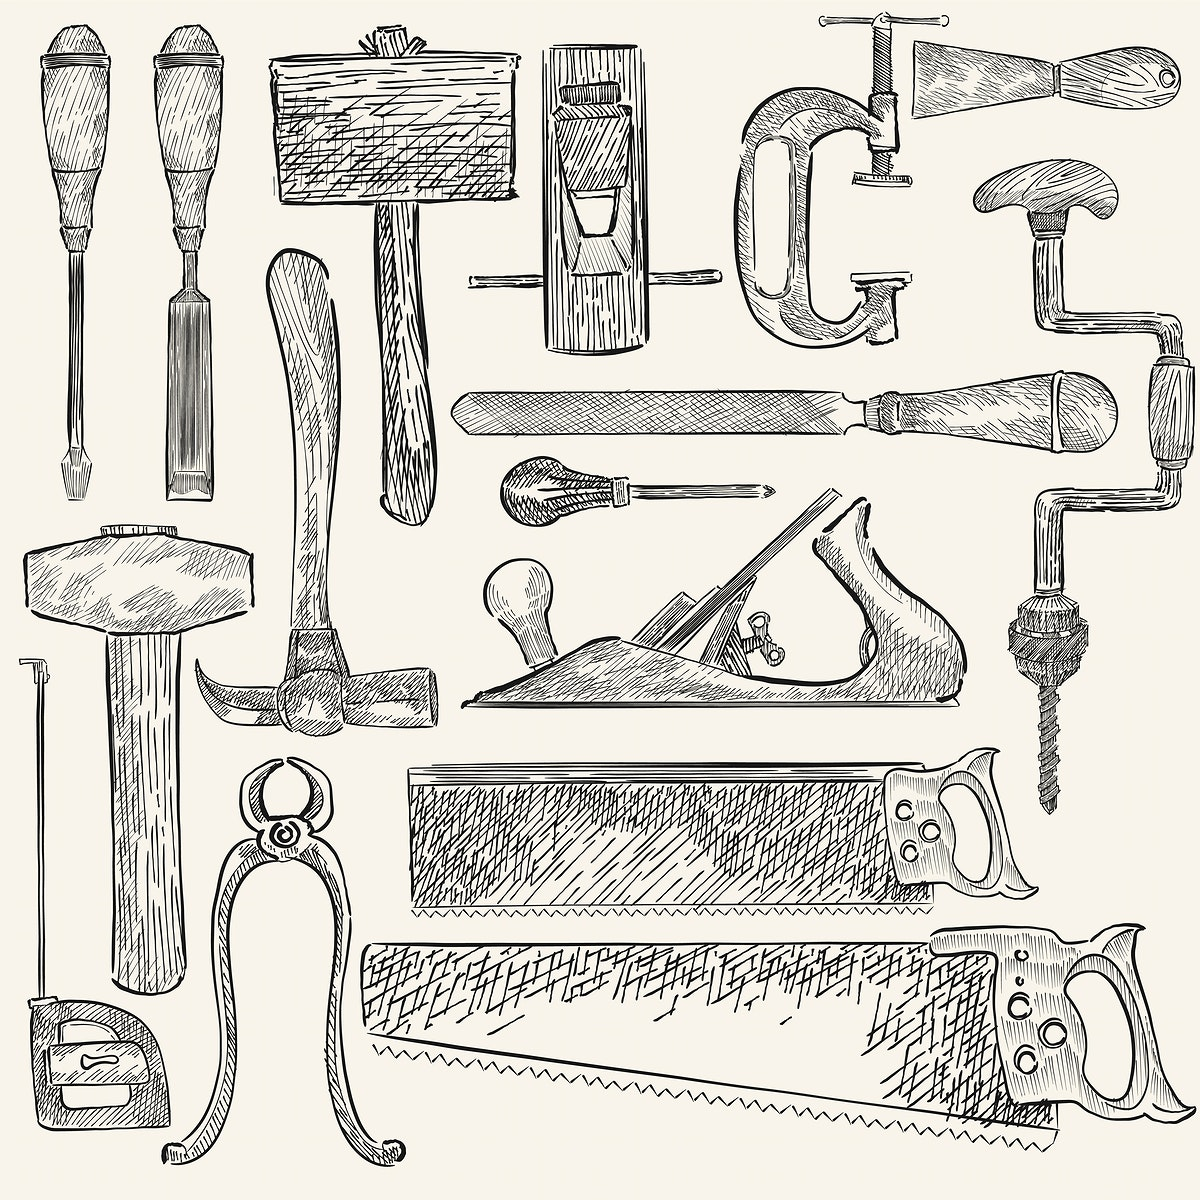 Illustration of a set of carpenter tools